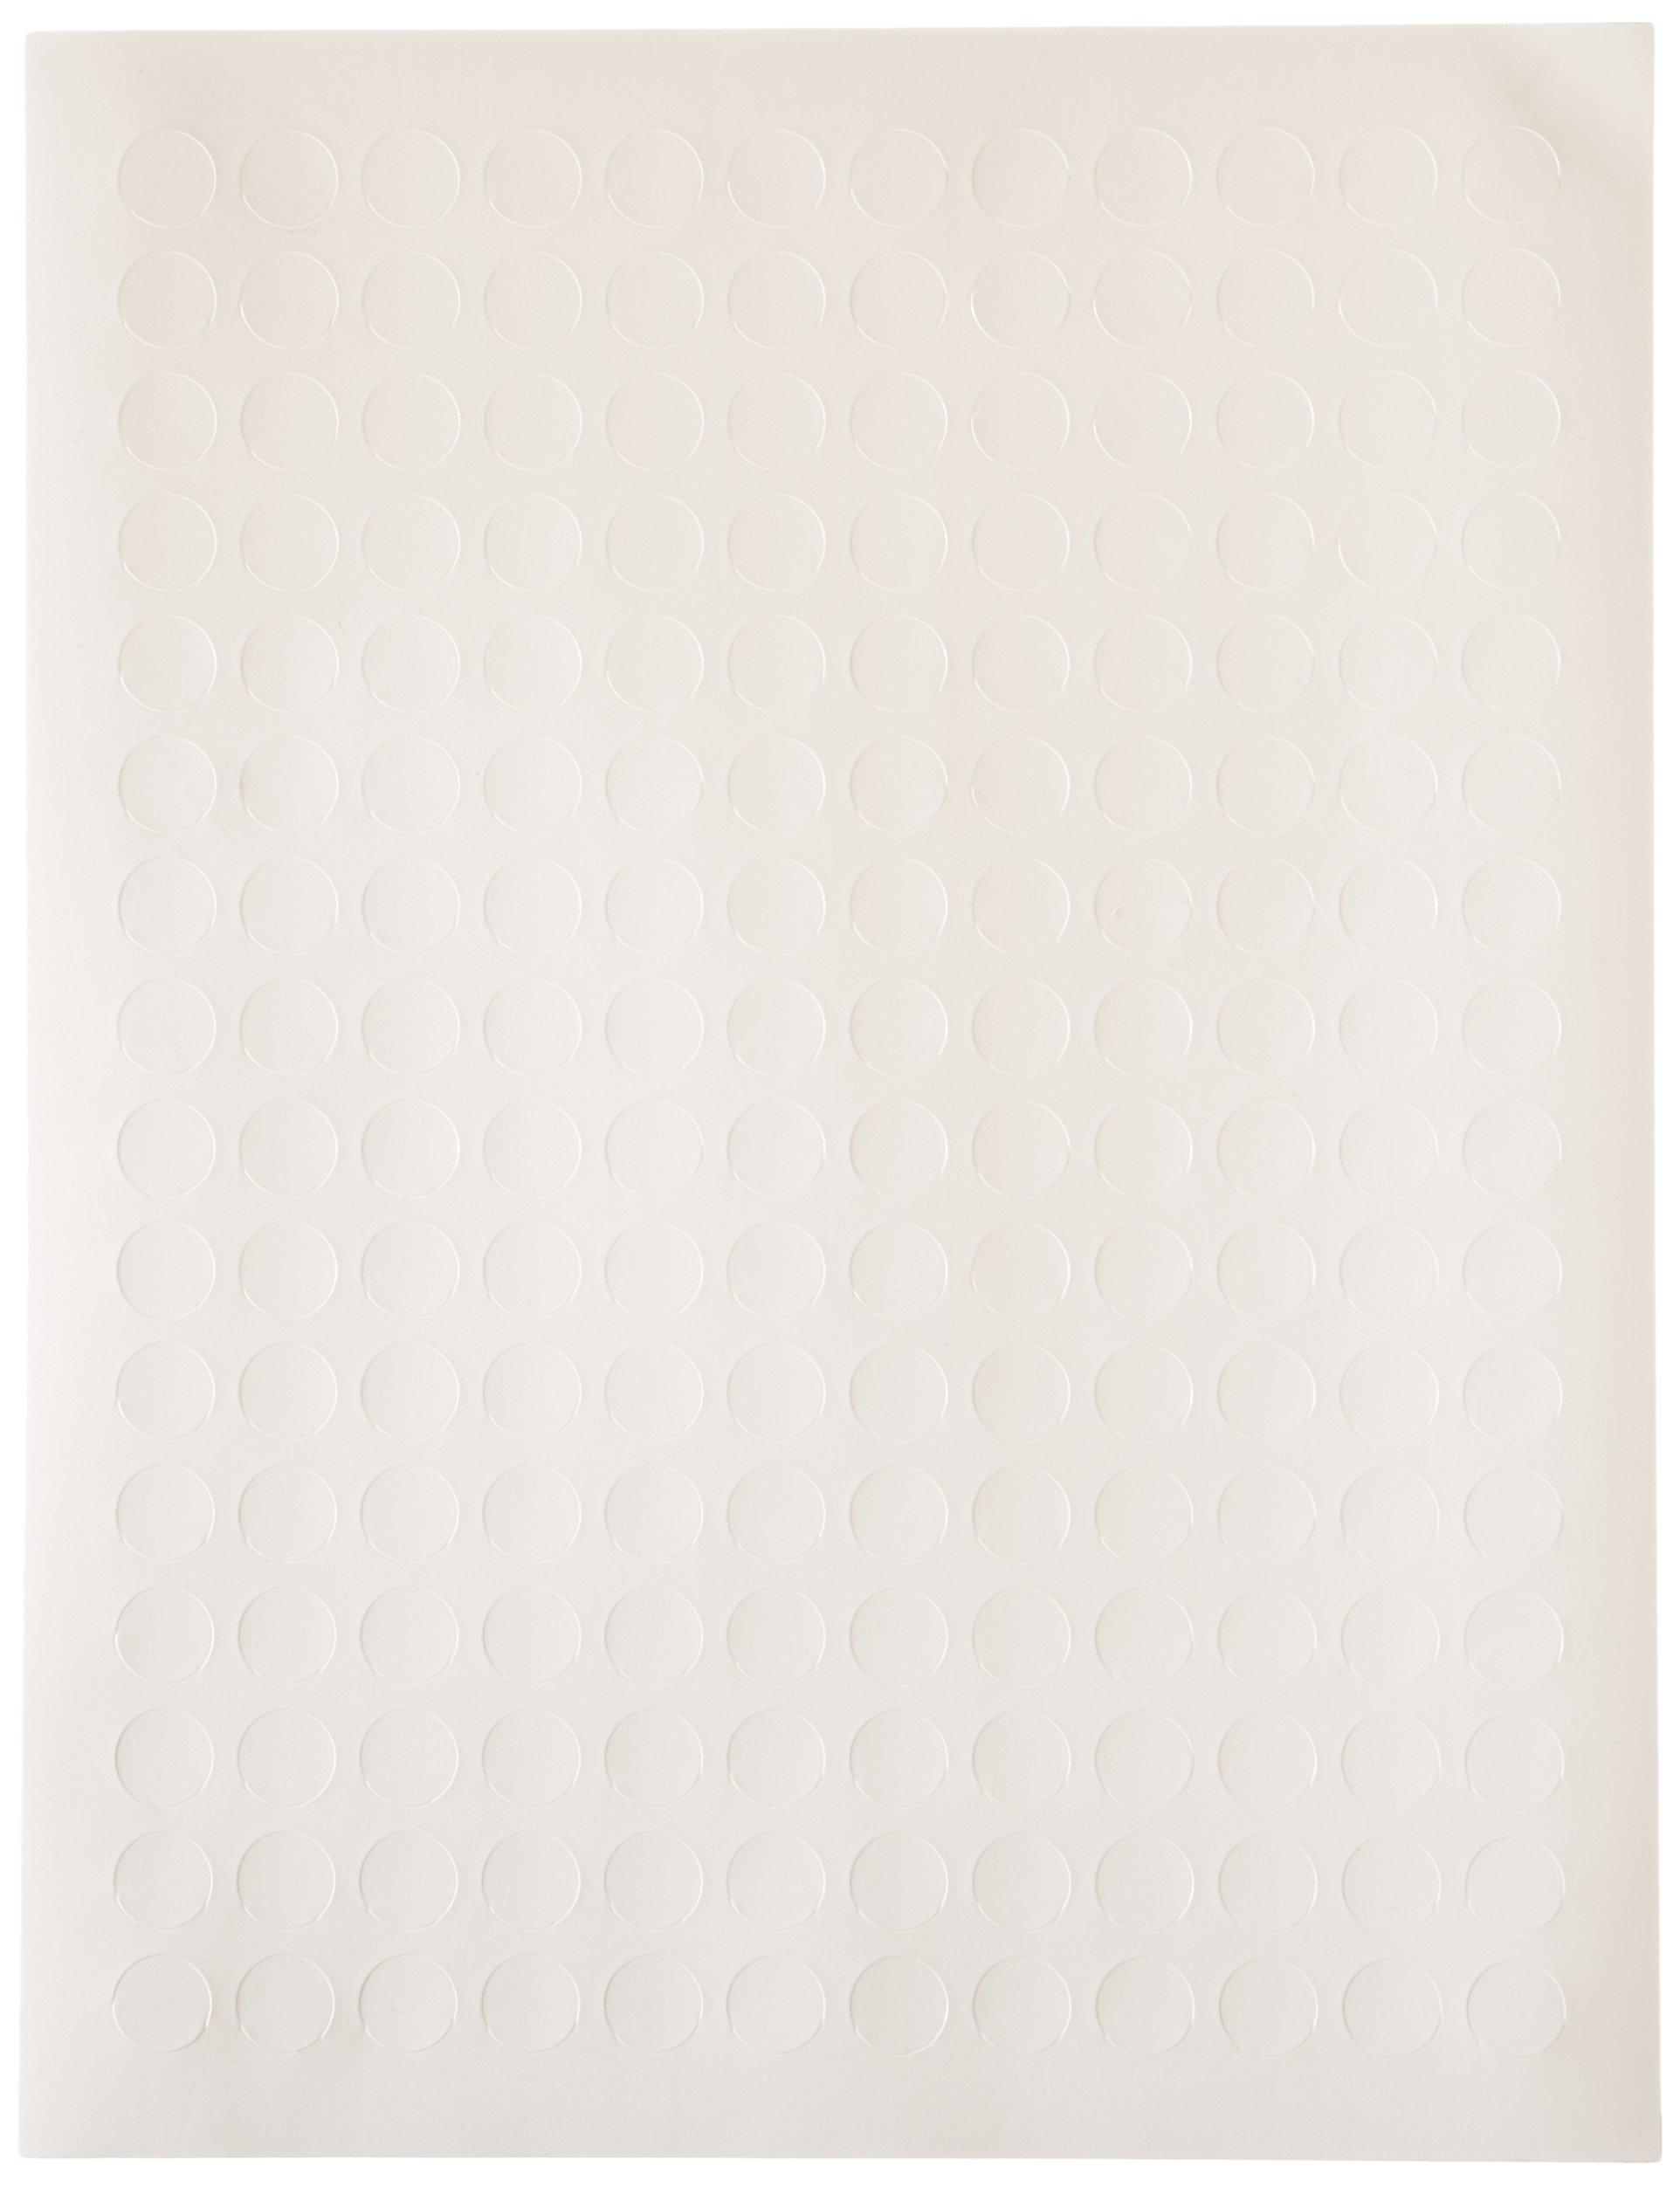 Diversified Biotech Tough-Spots SPOT-2000 Polyvinyl Laser Label, 1/2'' Diameter, White (Pack of 3840) by DIVERSIFIED BIOTECH